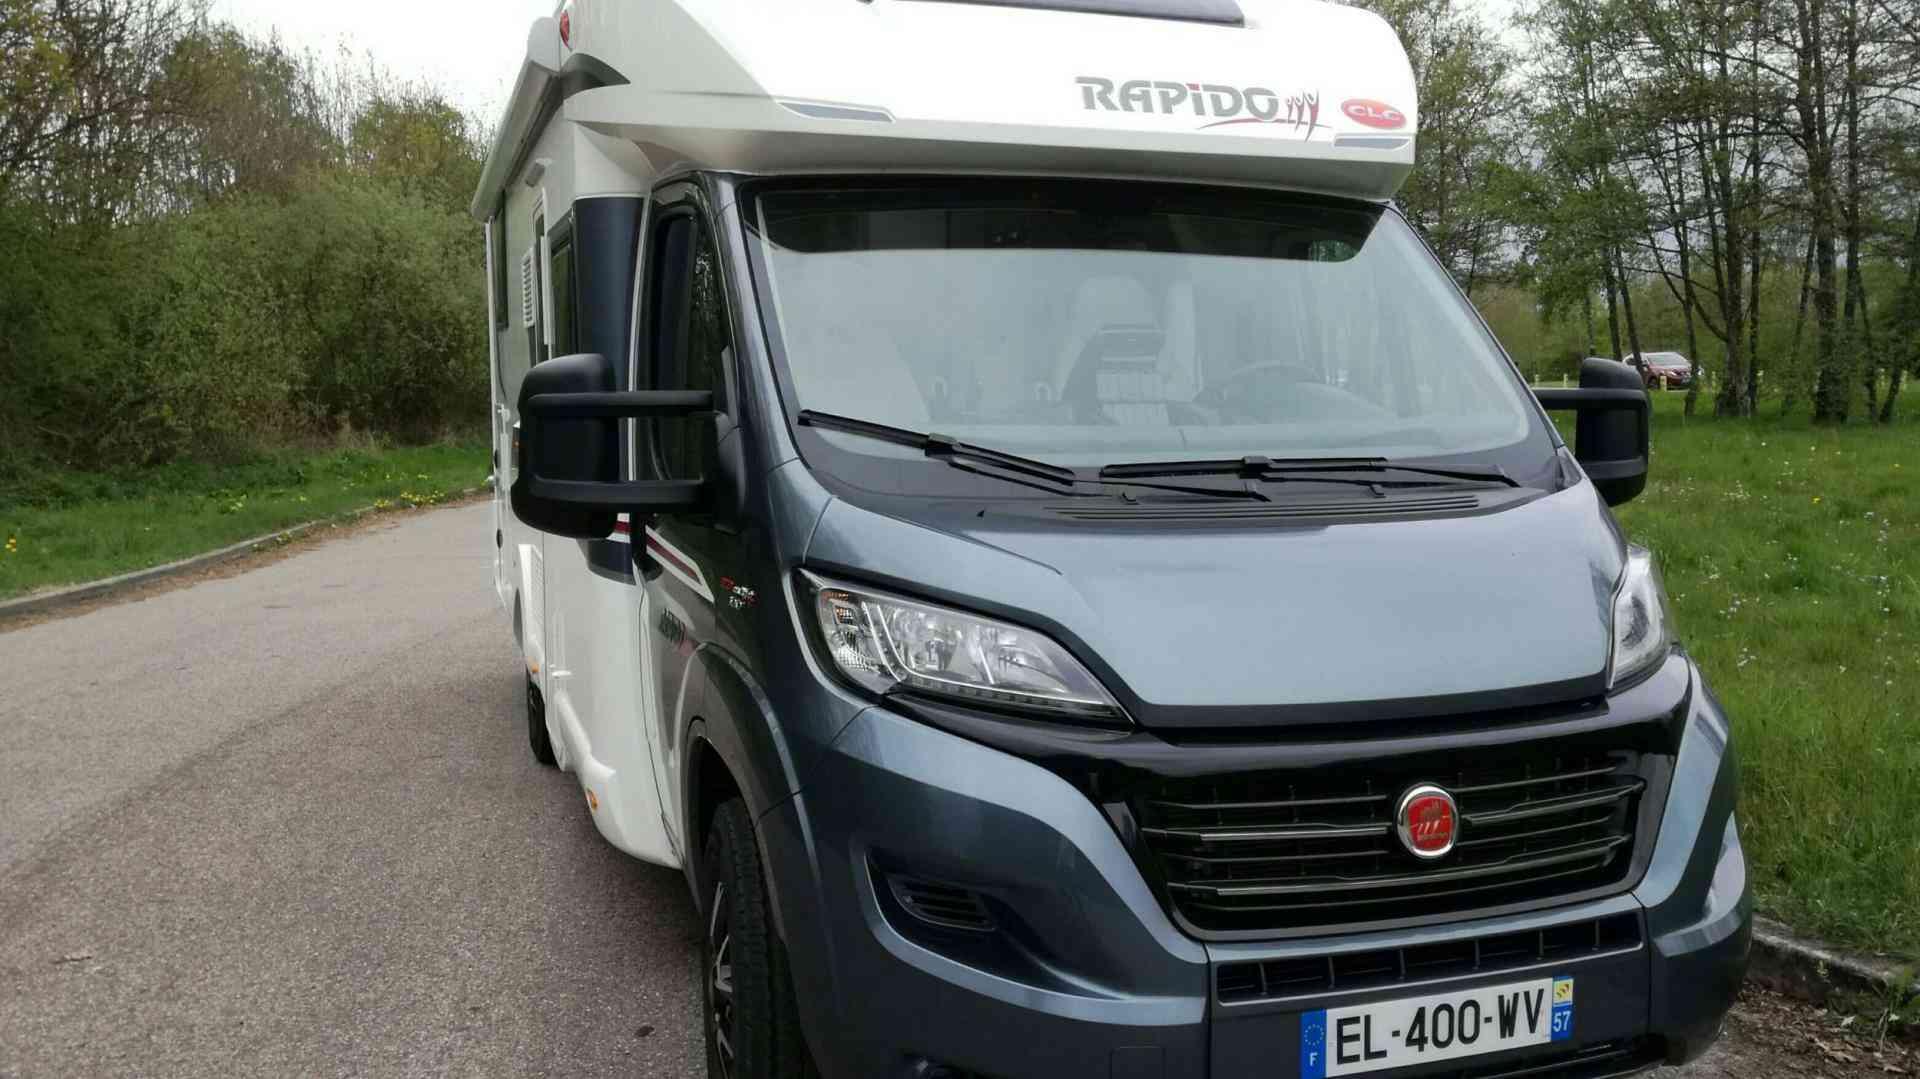 camping-car RAPIDO 696 FF